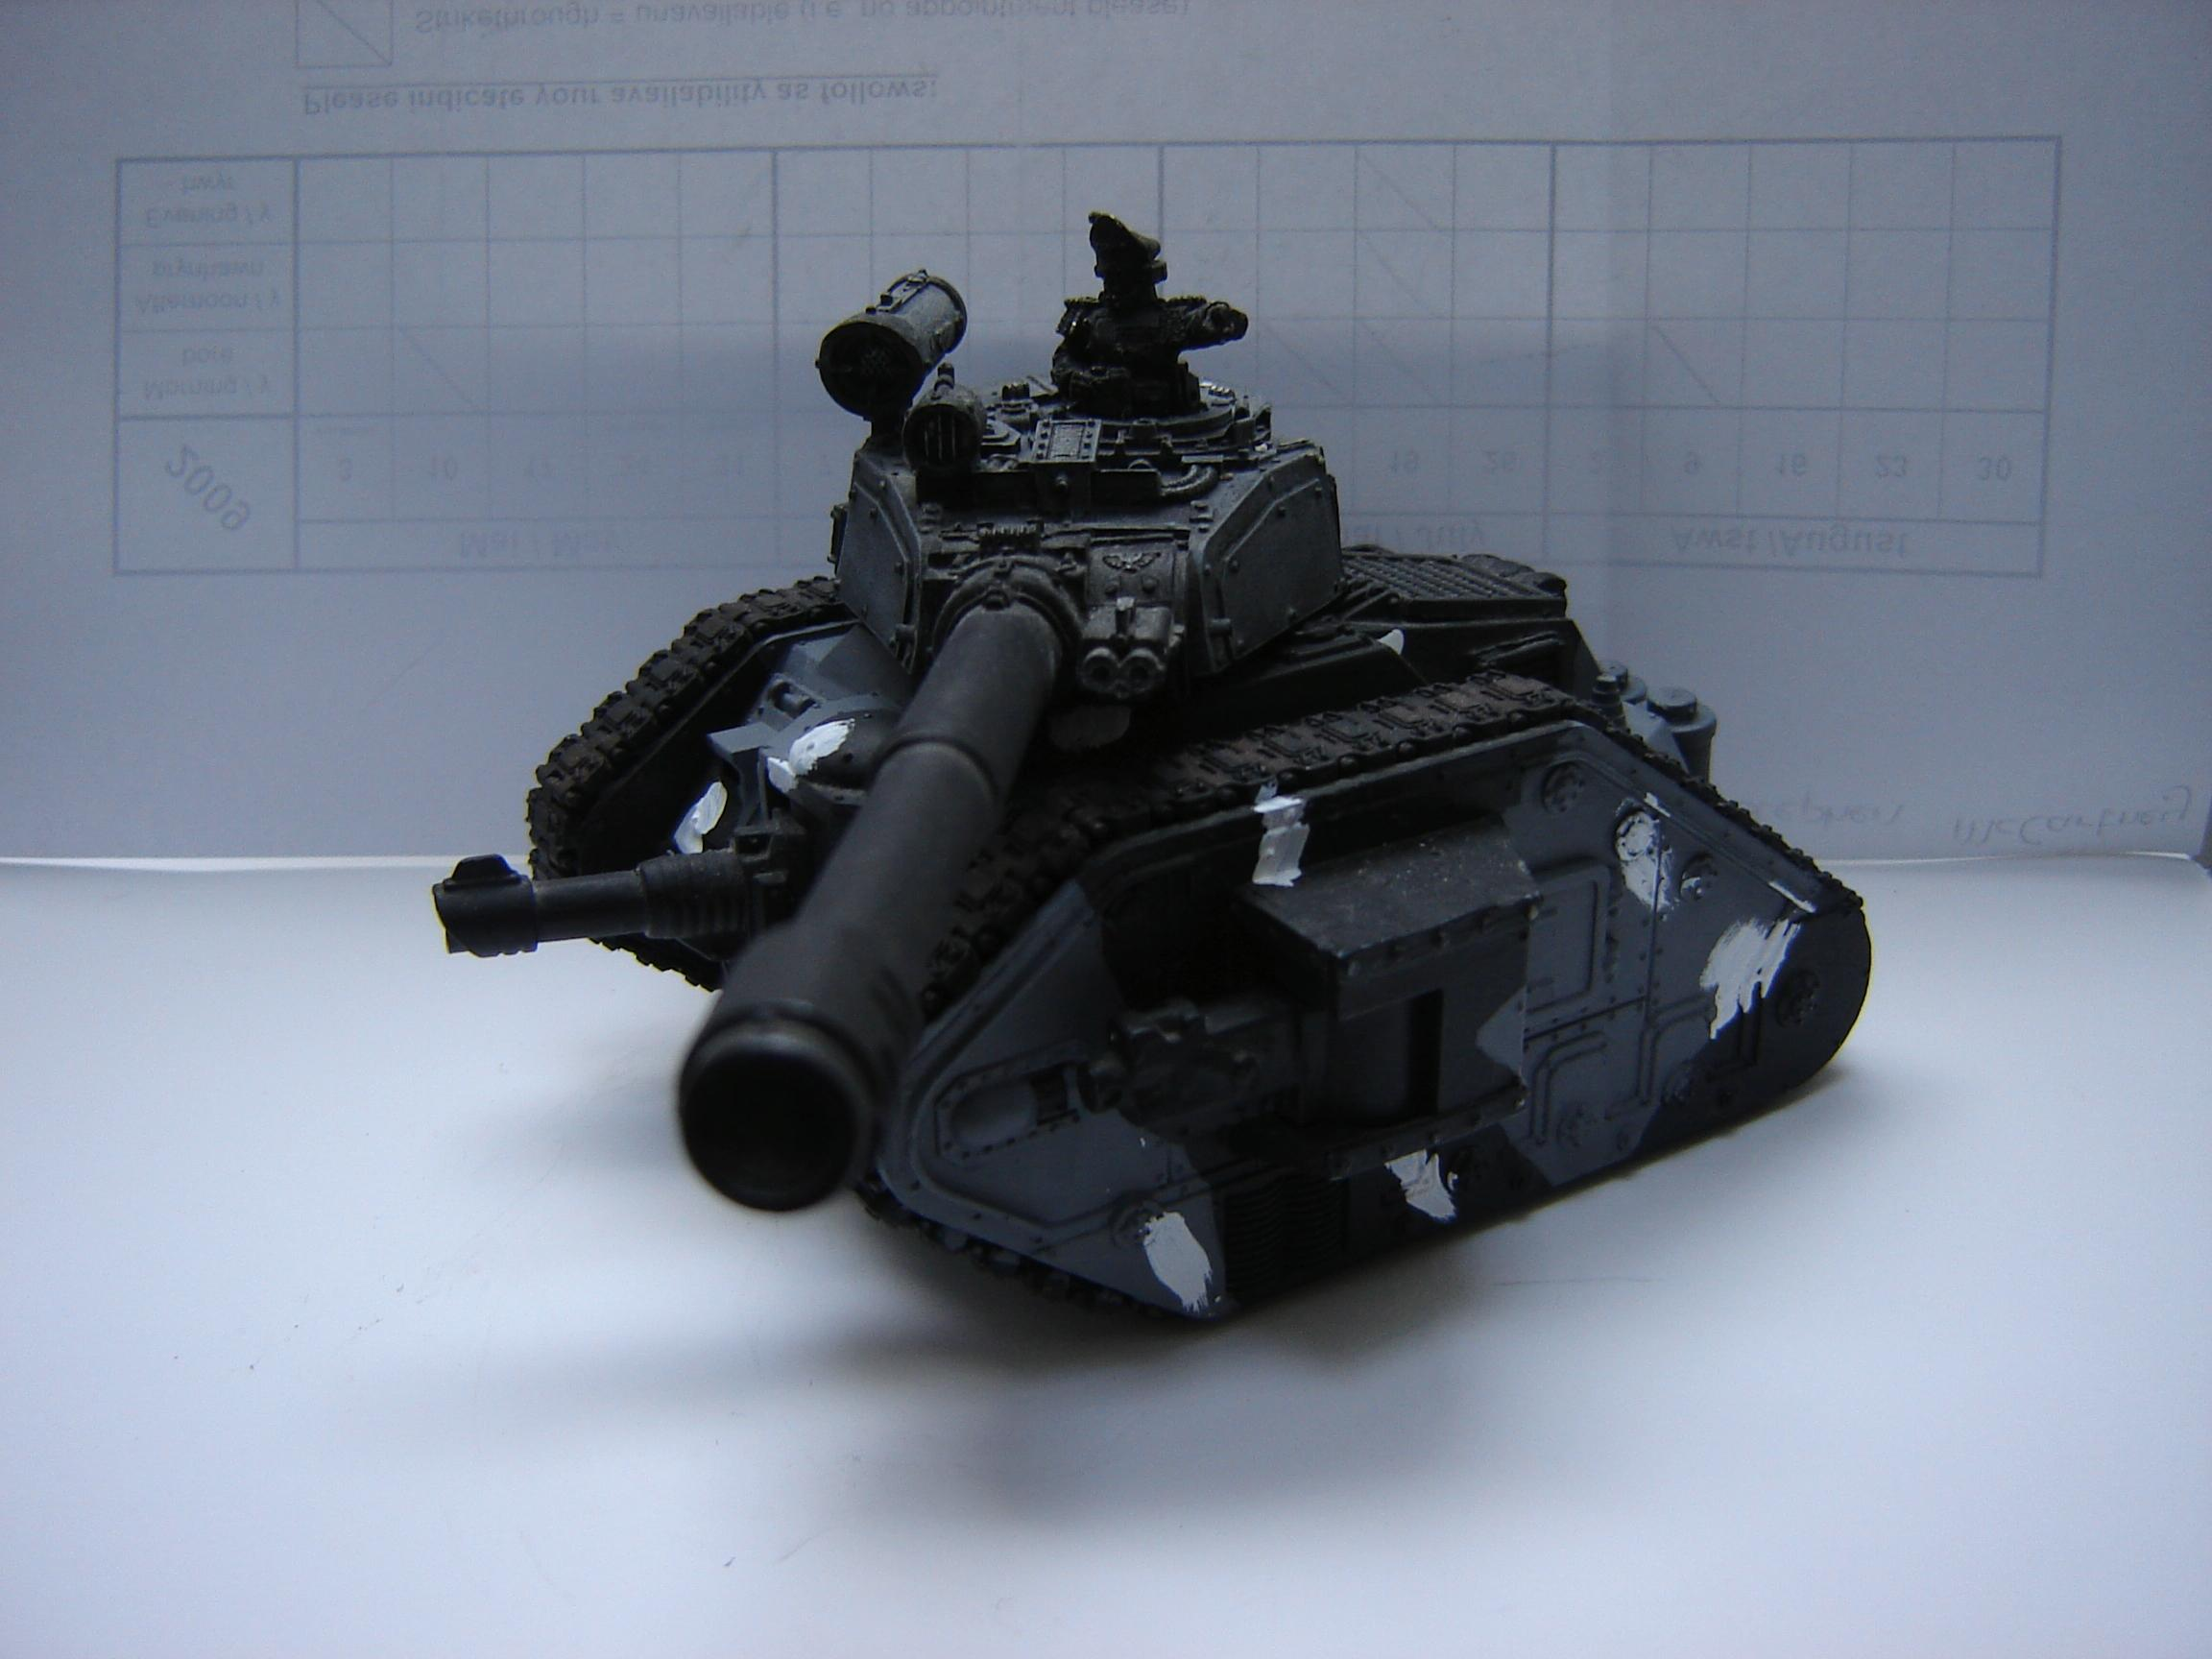 Armored Company, Basilisk, Hellhound, Imperial Guard, Leman Russ, Tank, Urban Camo, Vanquisher, Warhammer 40,000, Work In Progress